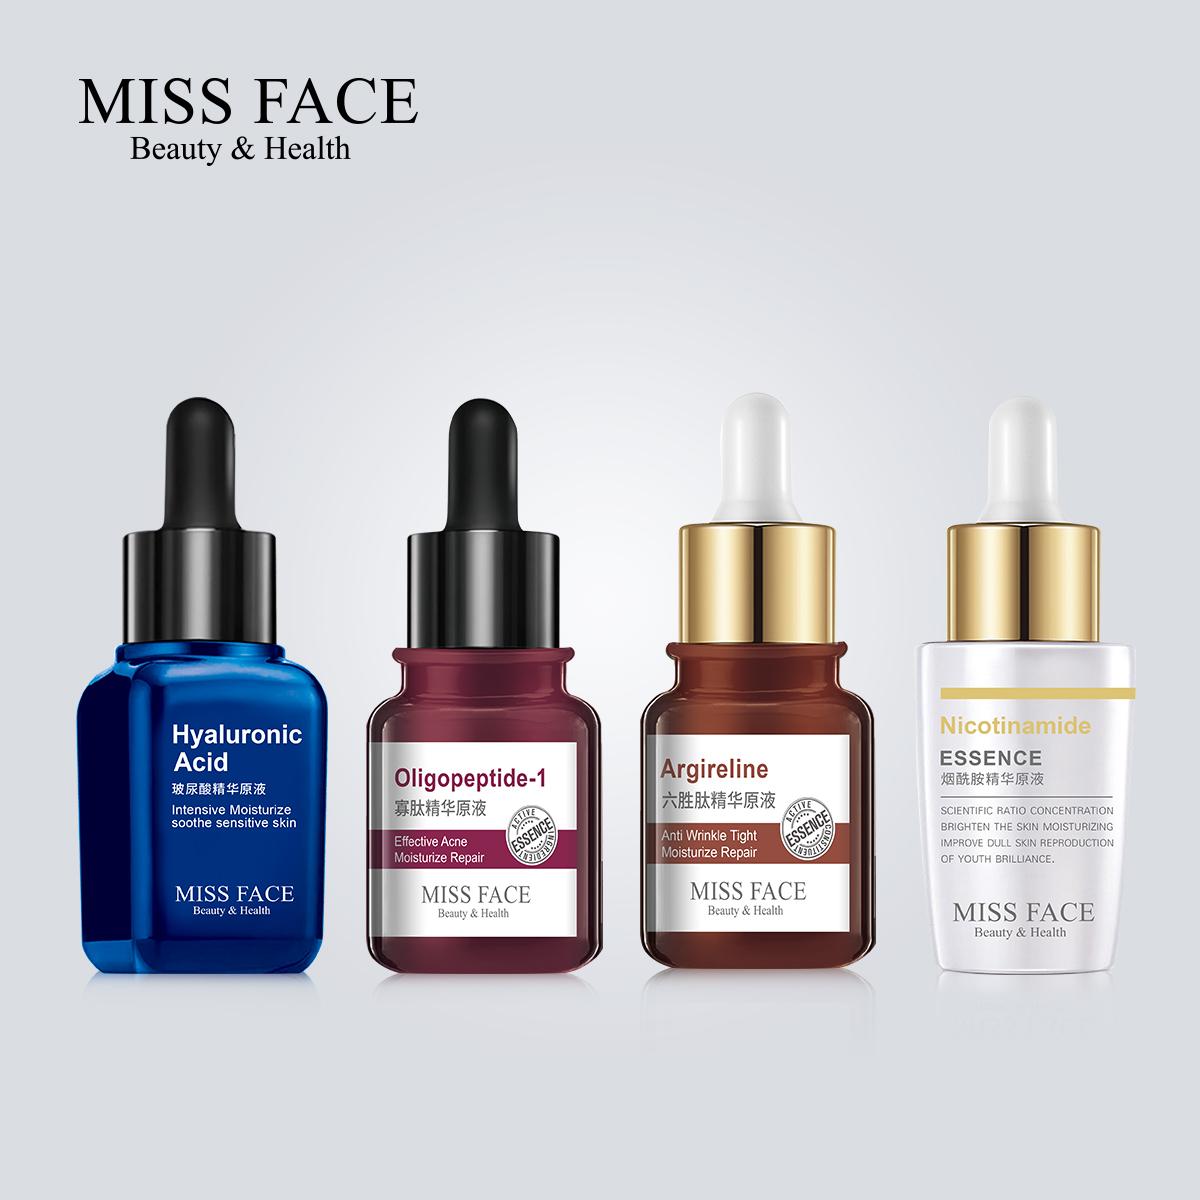 Missface面部精华原液组合装补水保湿去痘印提拉紧致淡化细纹